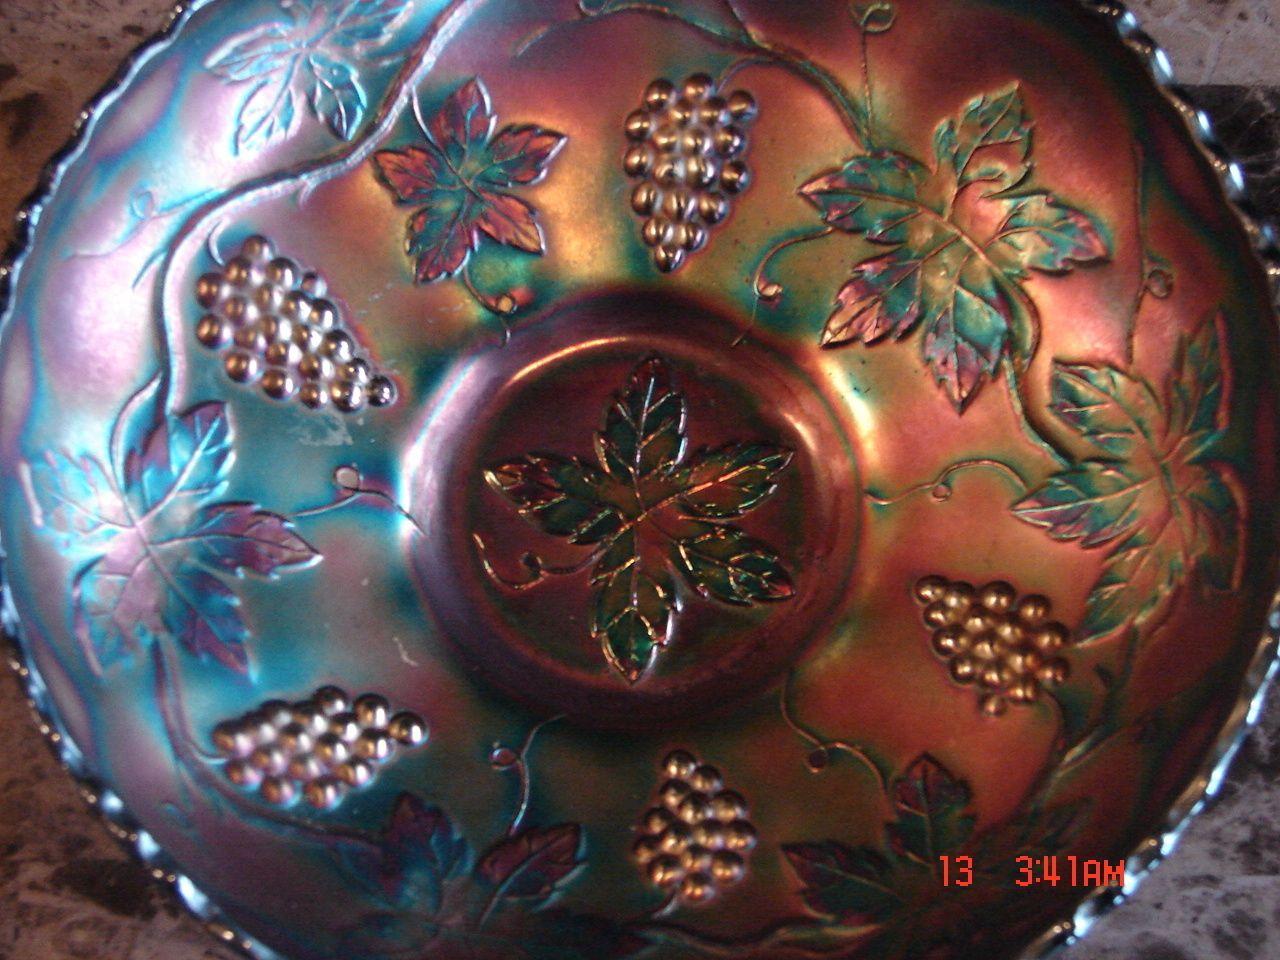 VINTAGE---FENTON CARNIVAL GLASS-----GRAPE LEAF DISH BOWL ...